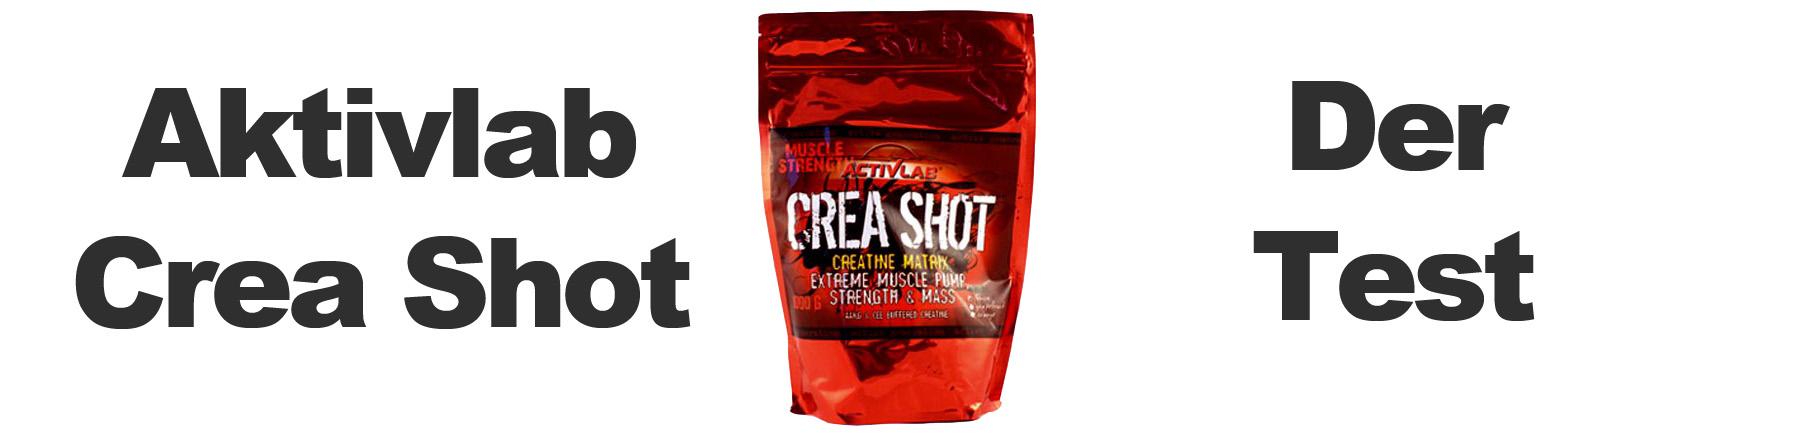 Aktivlab Crea Shot